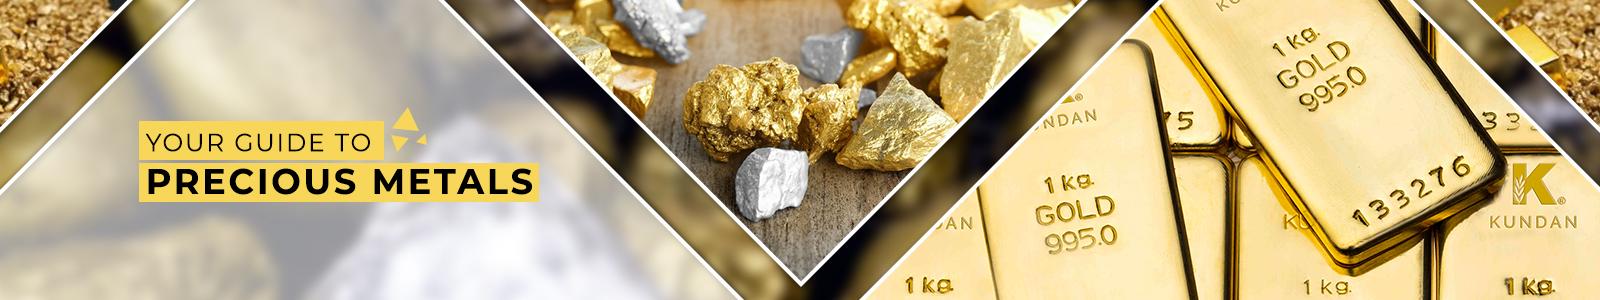 Your Guide To Precious Metals